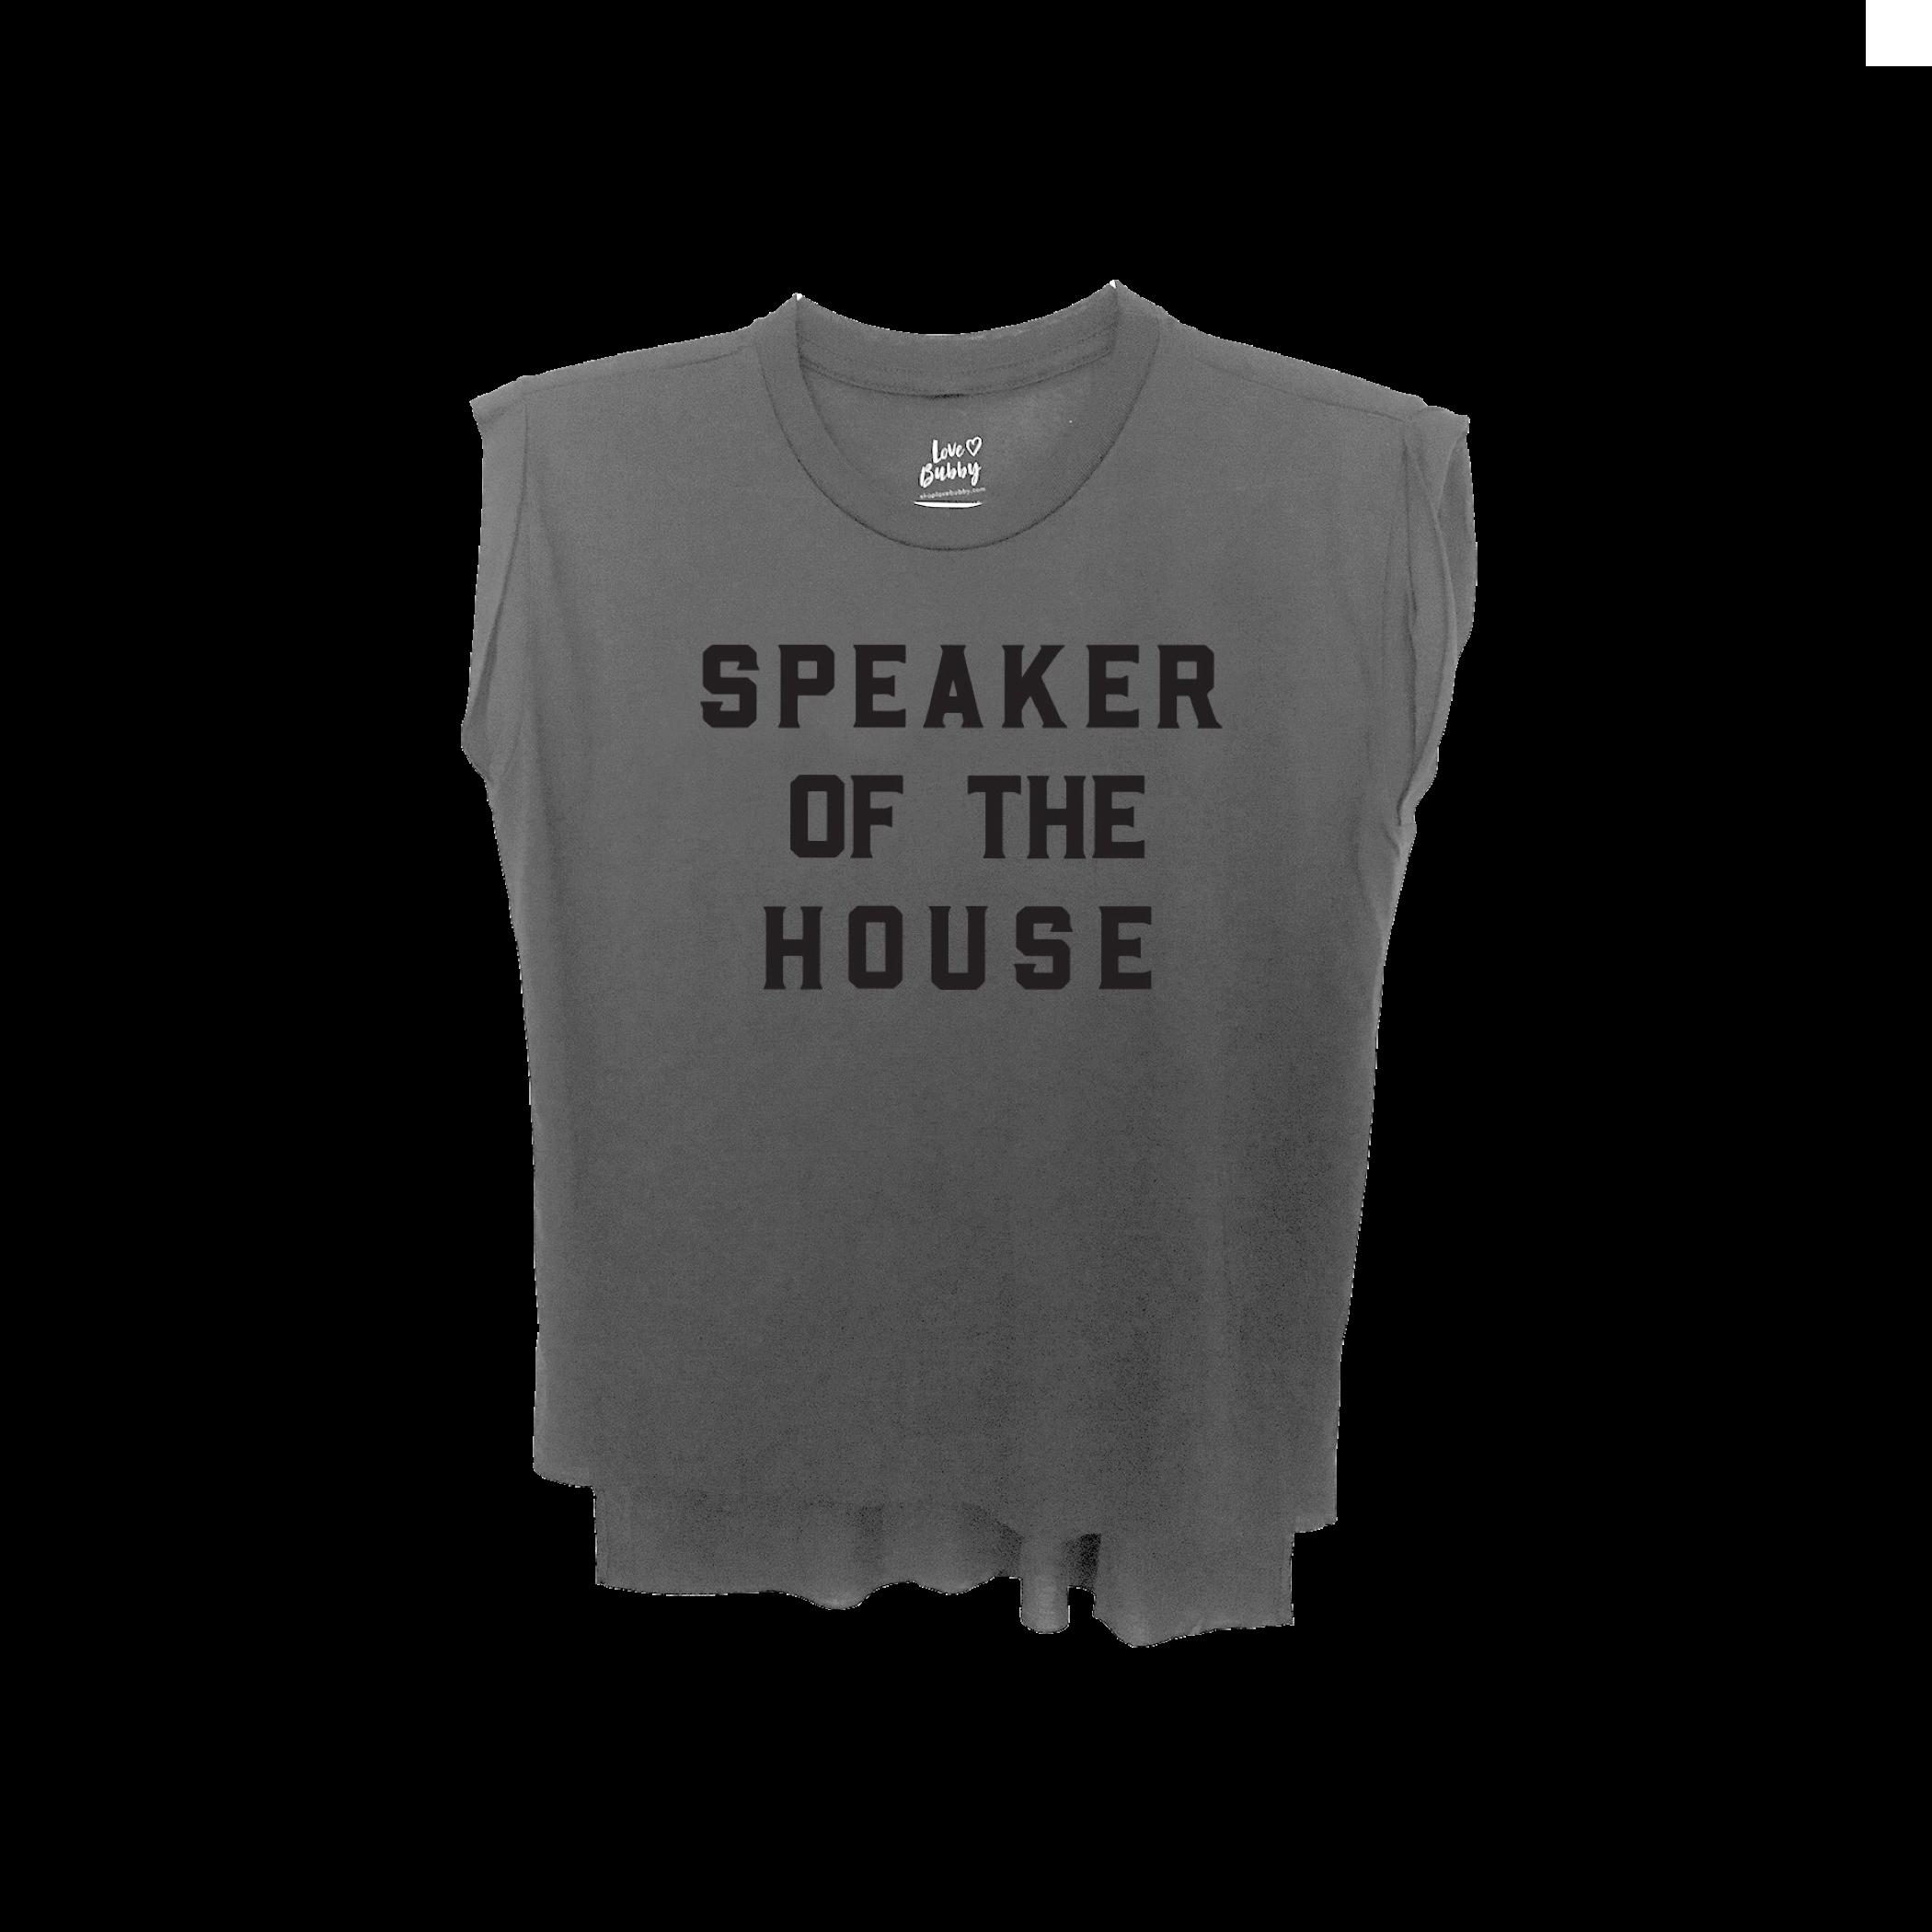 Speaker of the House - Women's Tee | Trada Marketplace